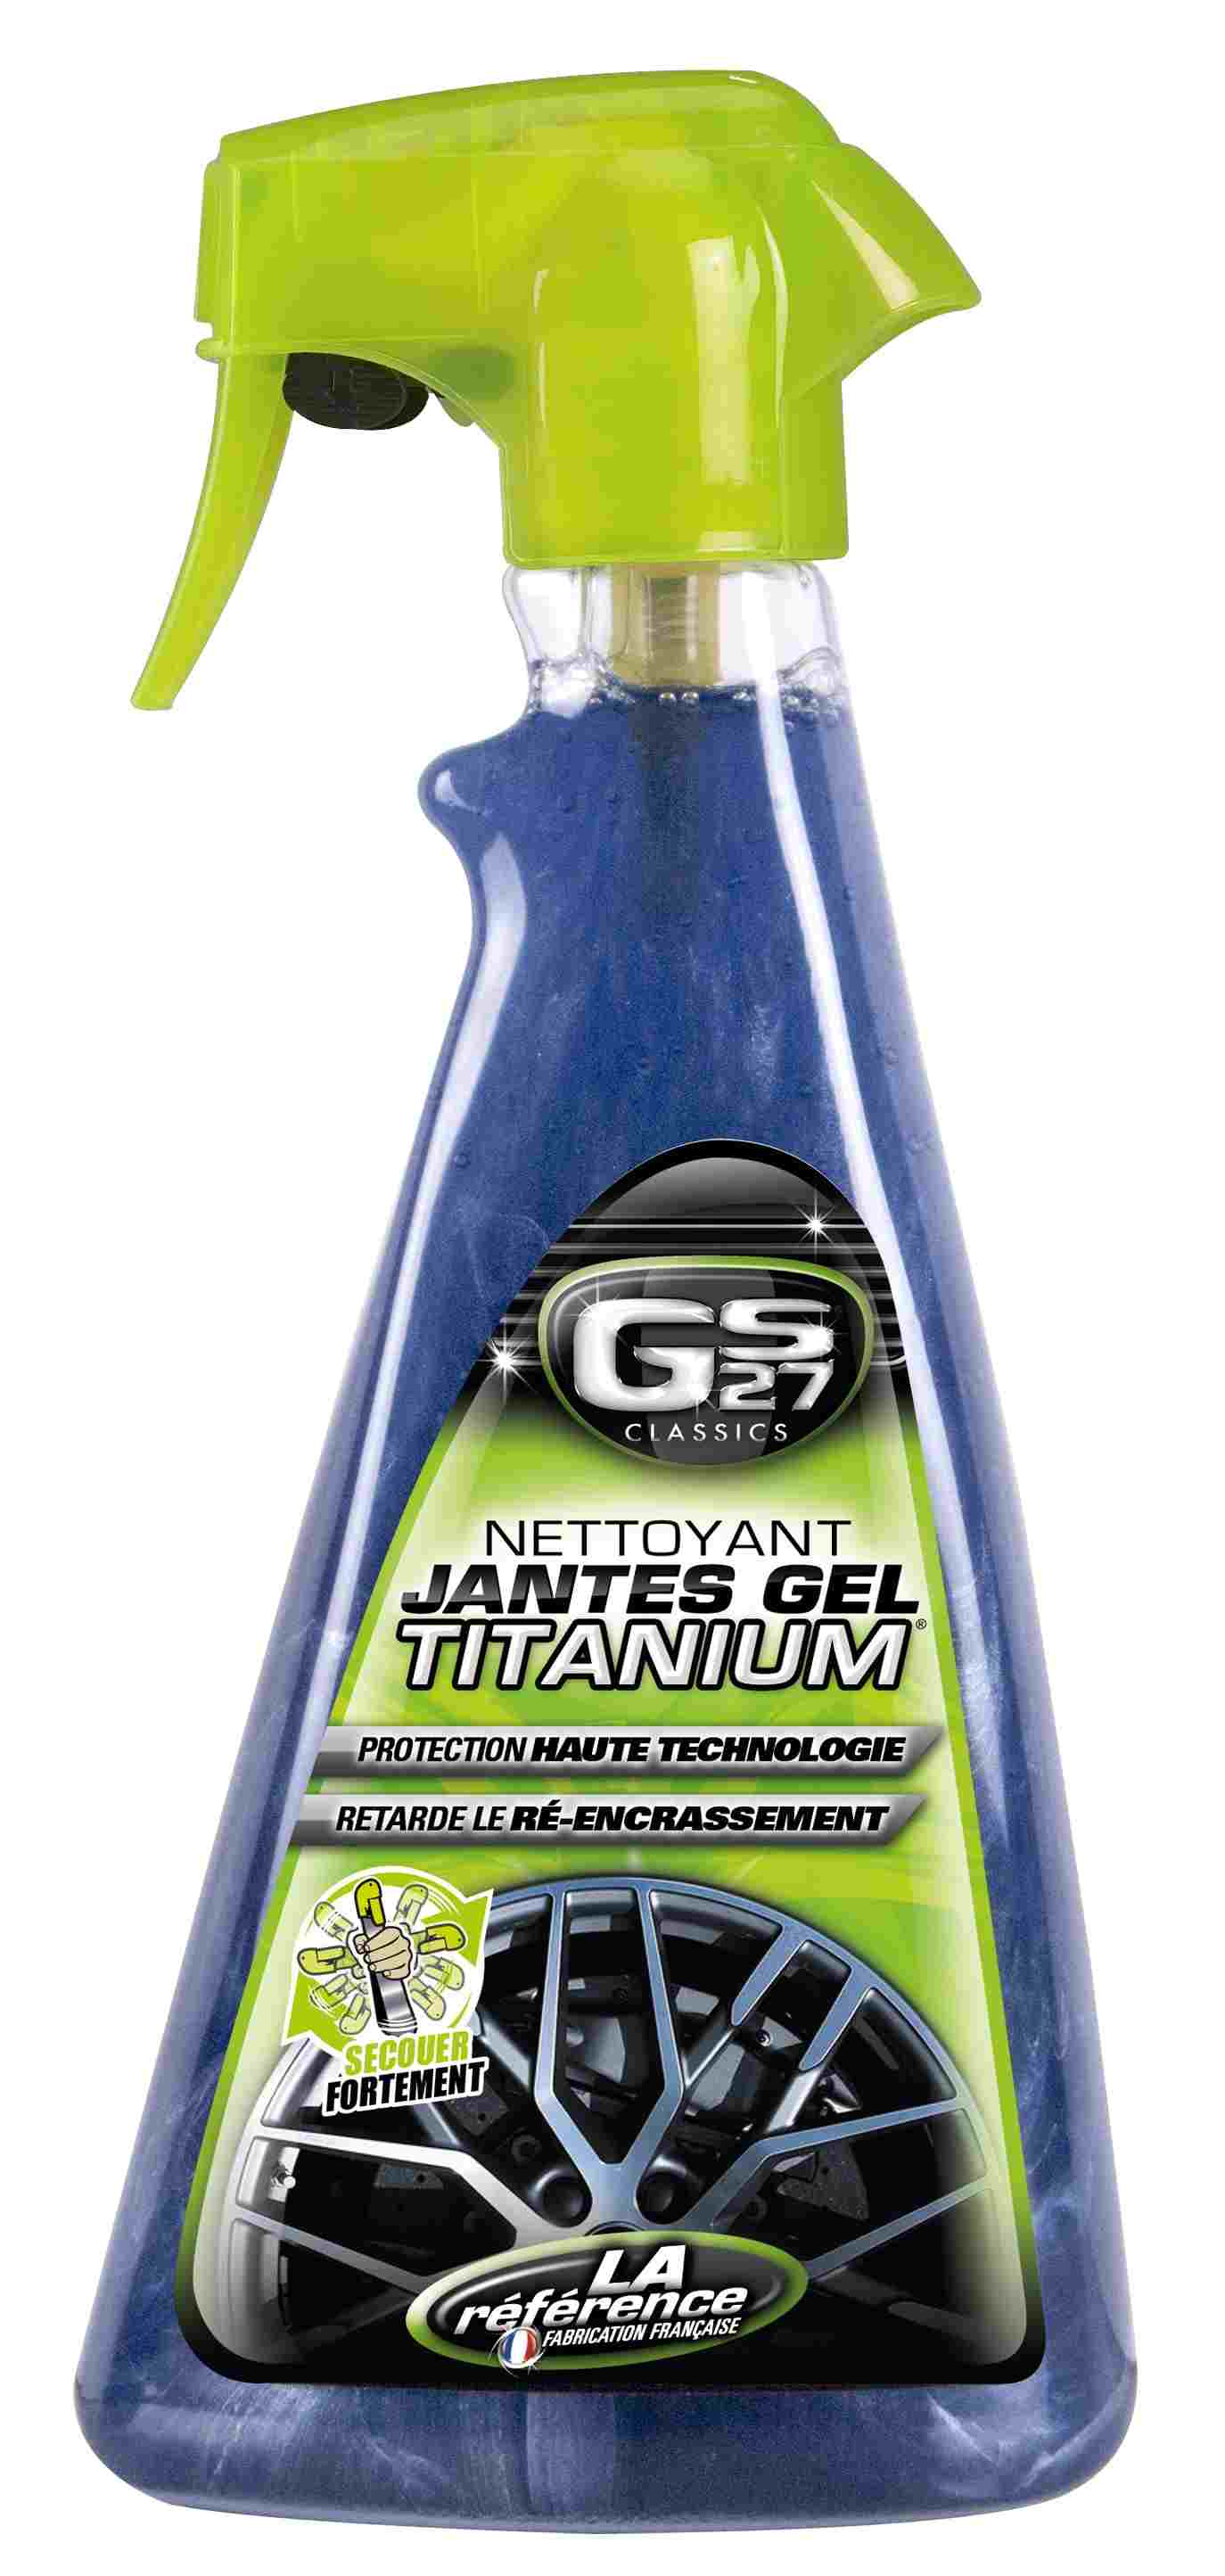 Nettoyant Jantes Gel Titanium